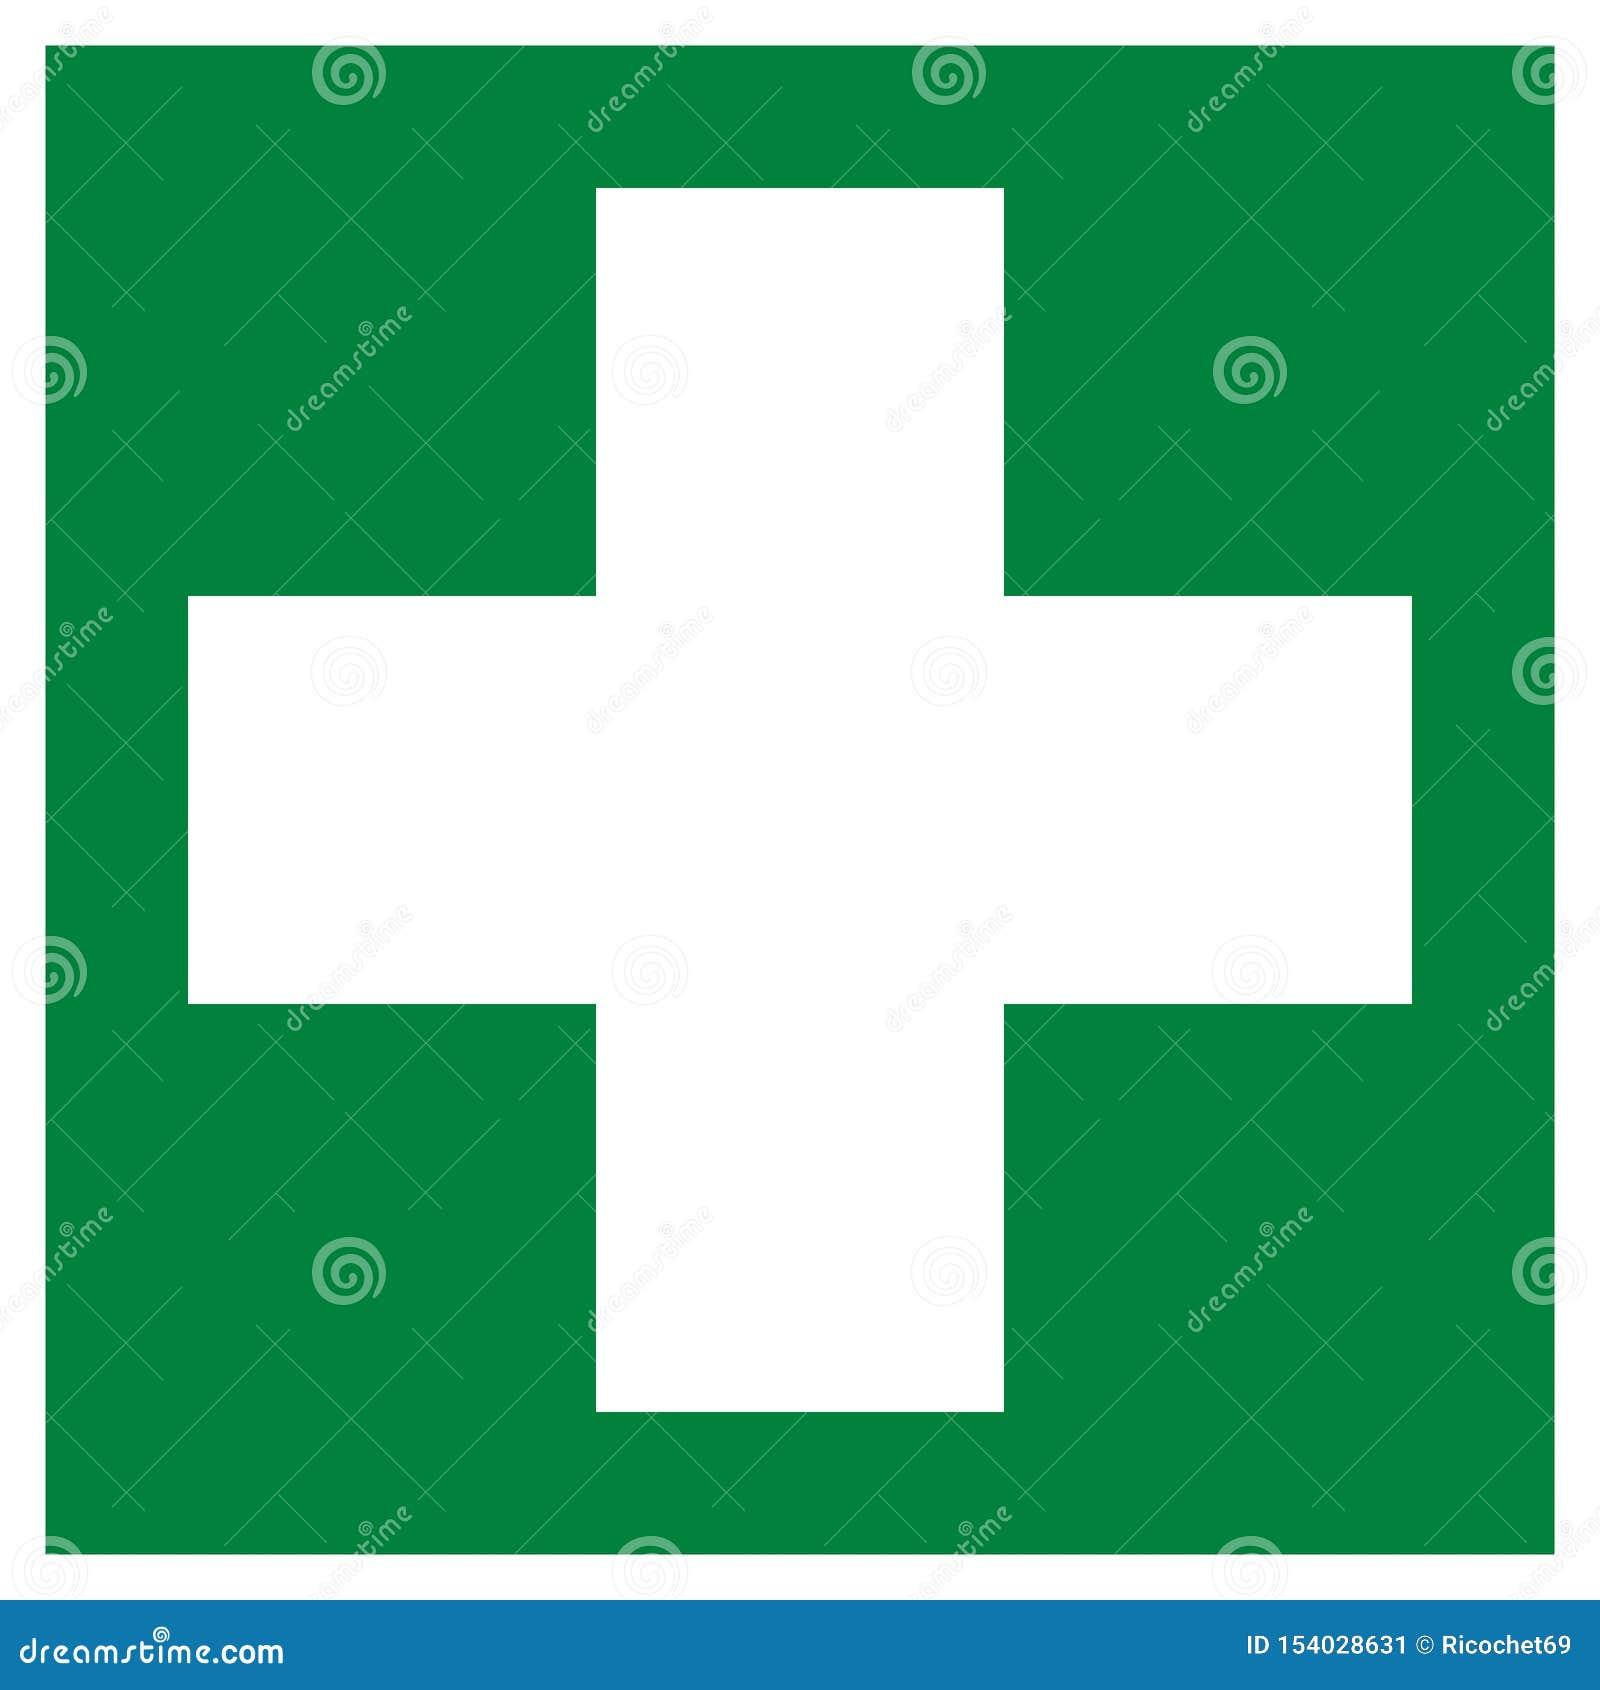 First aid symbol pictogram